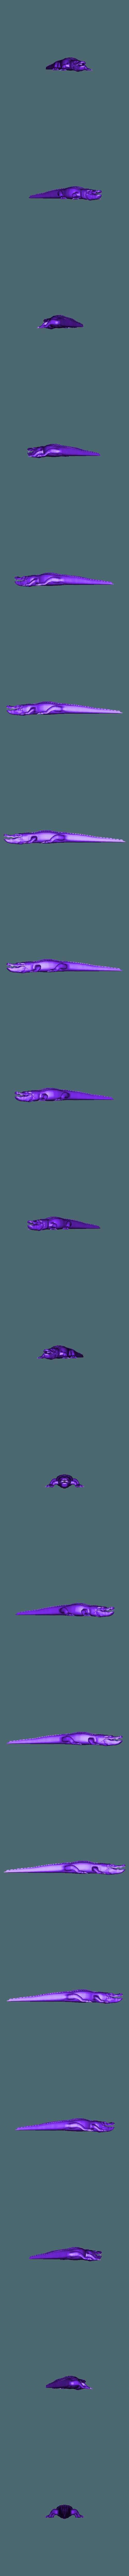 Aligator.obj Télécharger fichier OBJ gratuit alligator • Objet à imprimer en 3D, vaibhav210singh